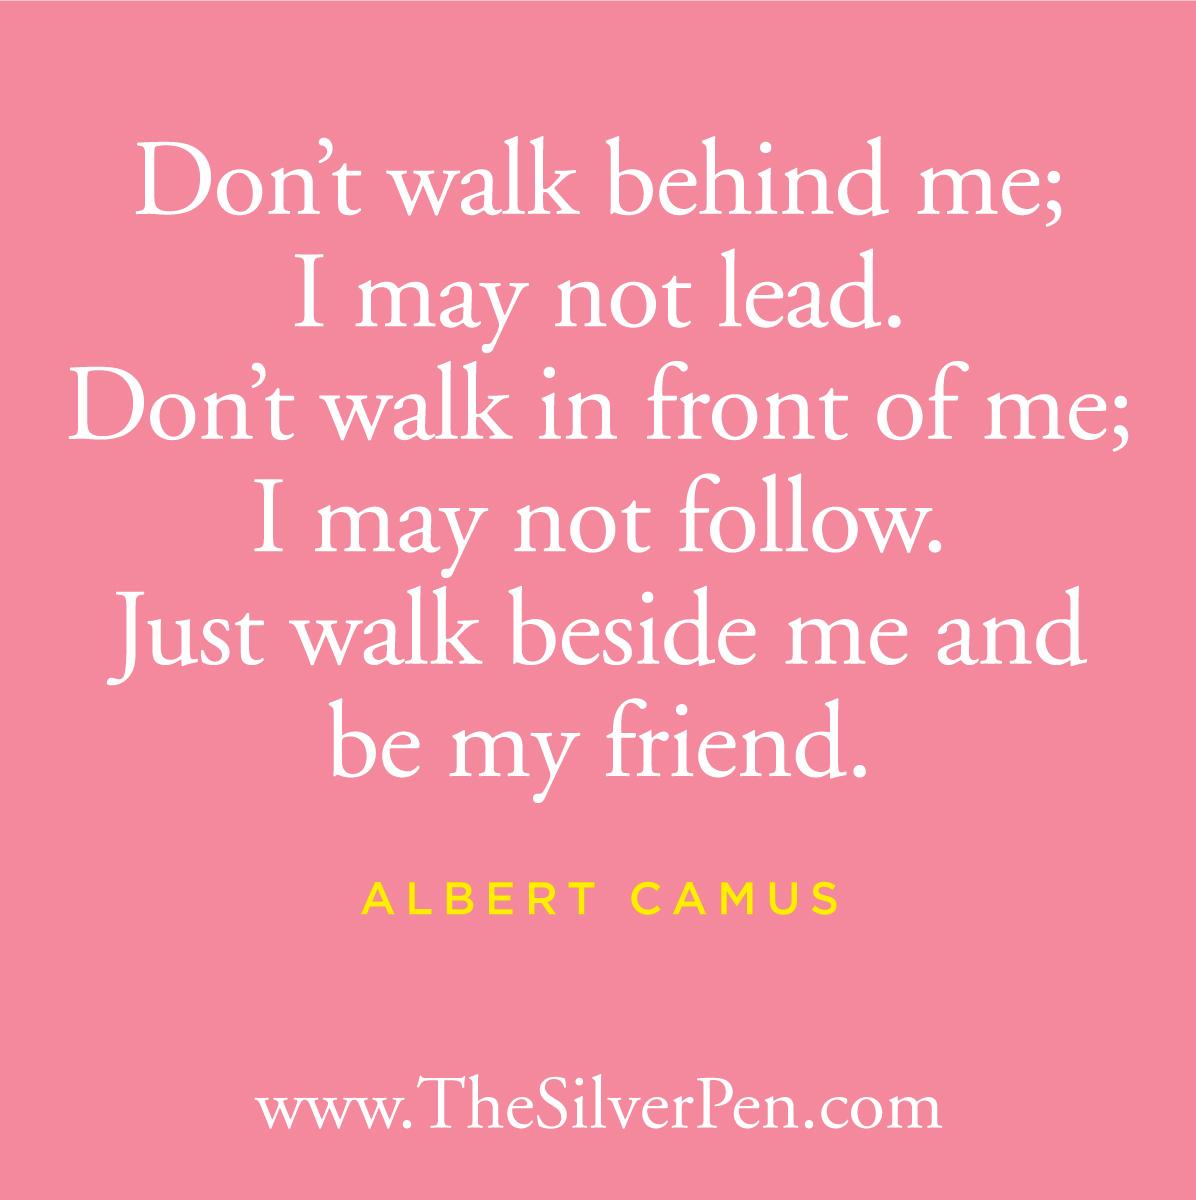 Copyright Free Inspirational Quotes Quotesgram: Cancer Quotes Inspirational. QuotesGram